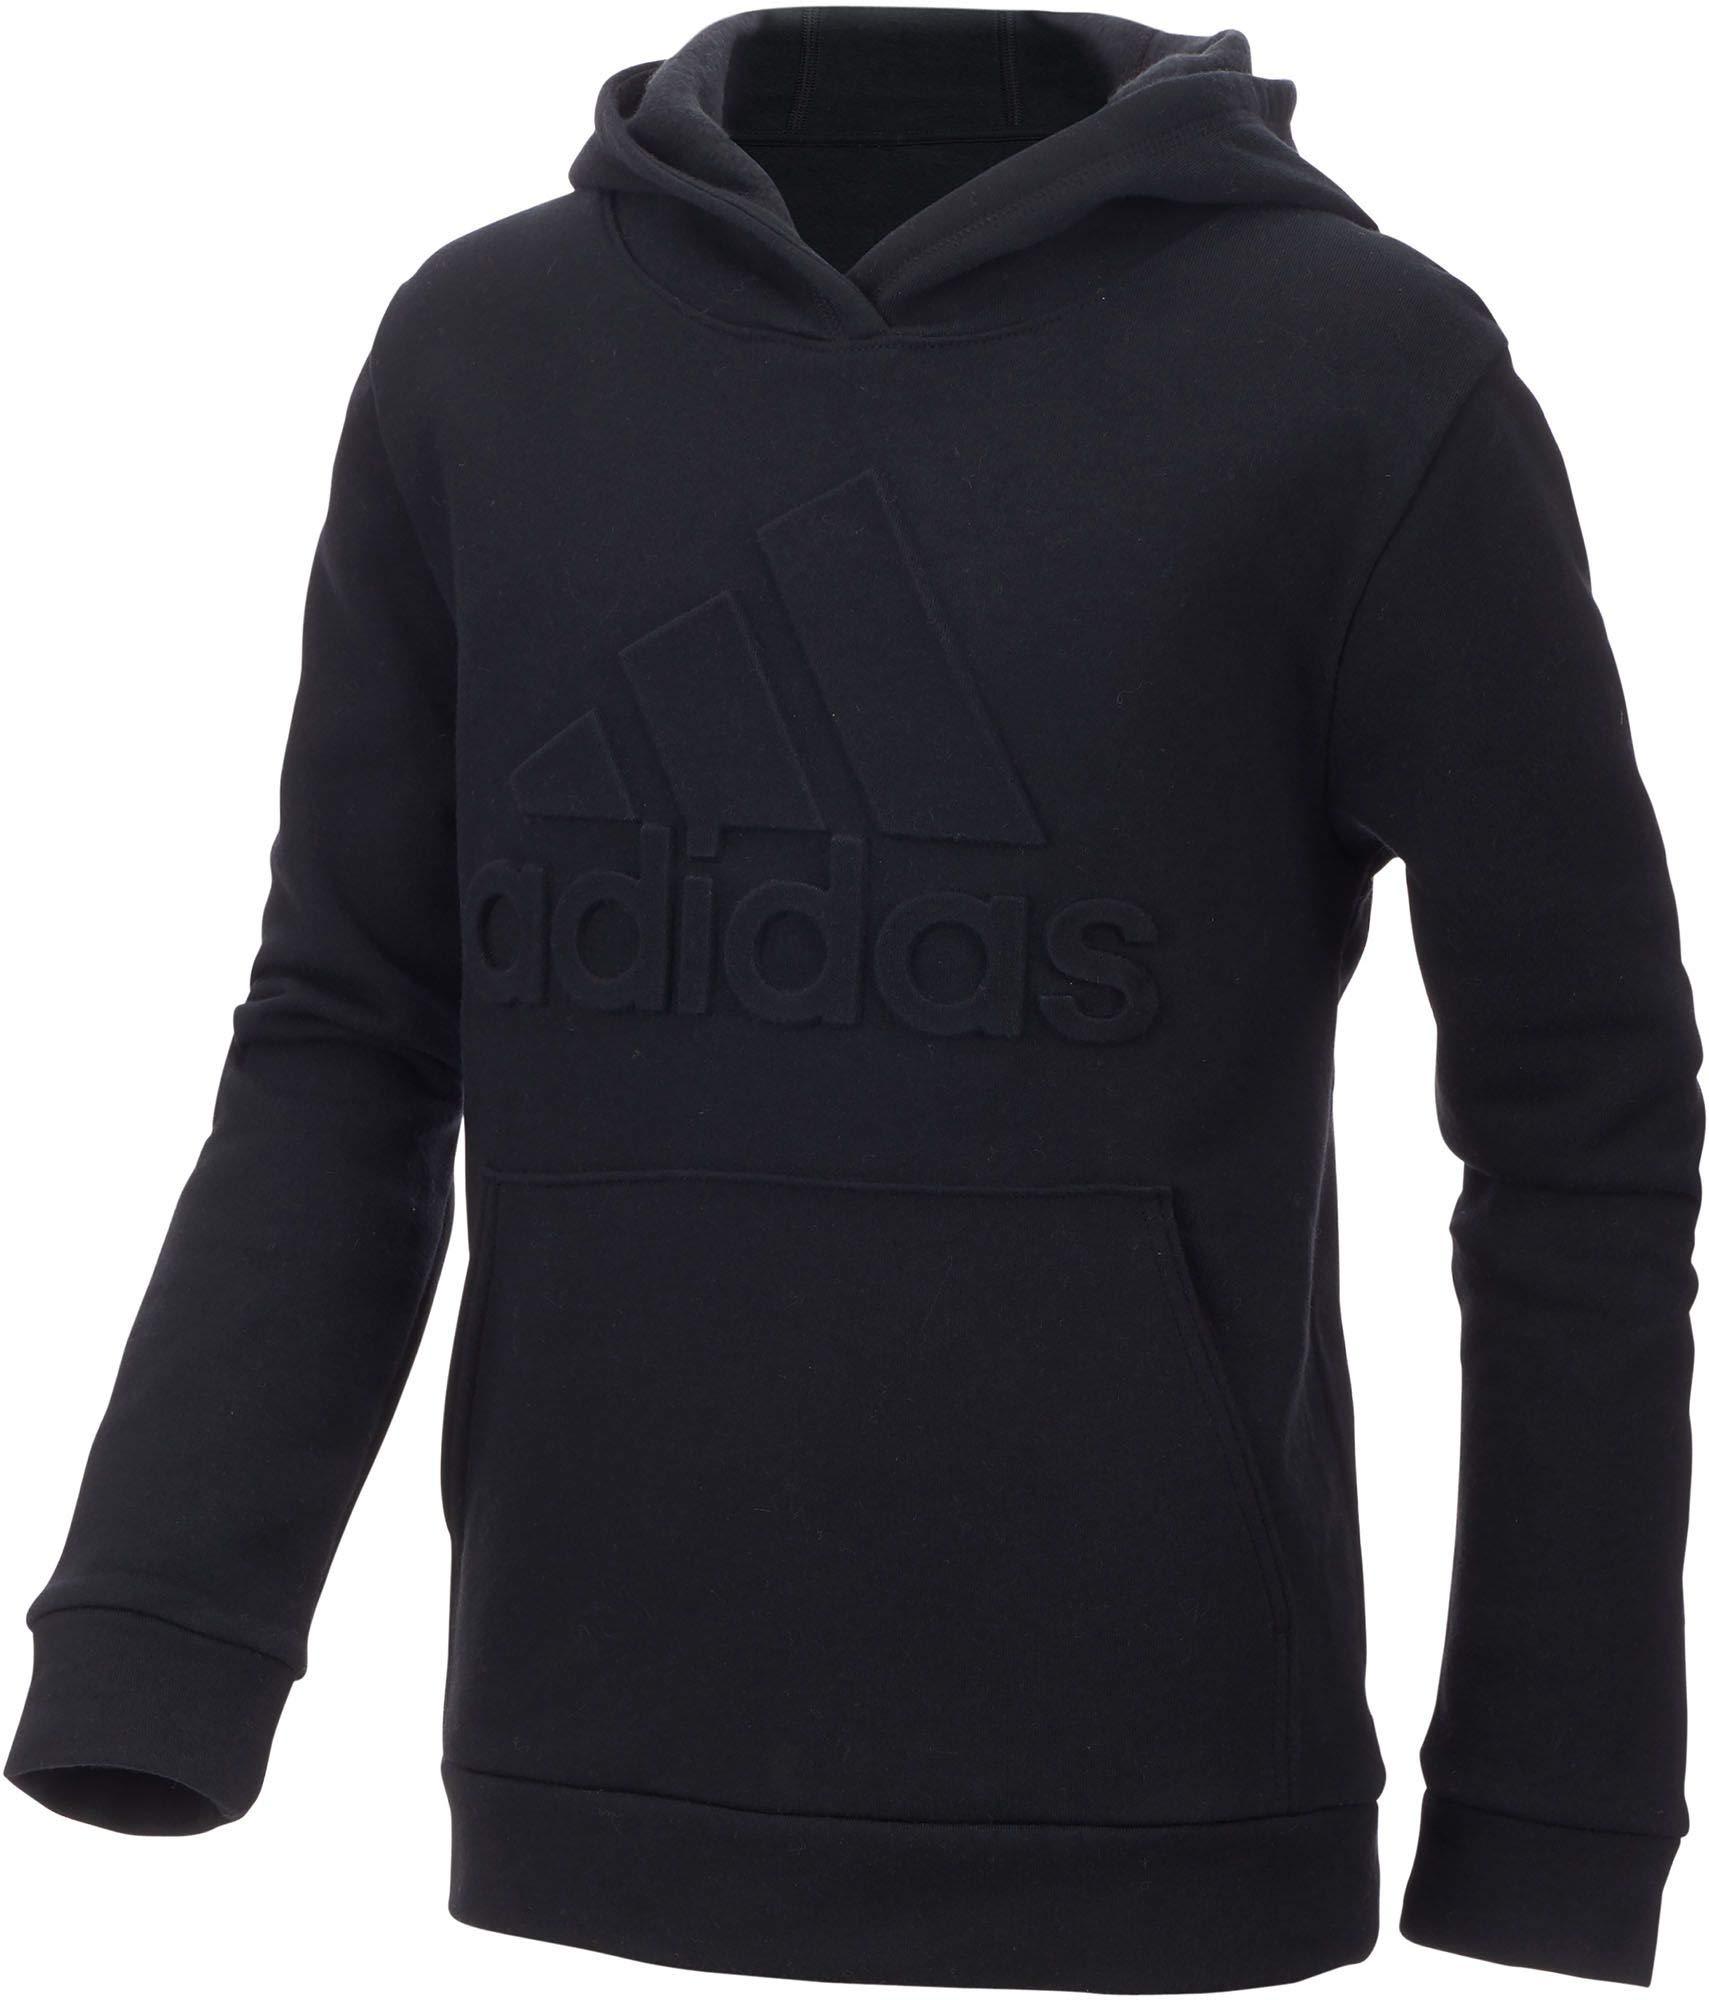 adidas Boy's Exclusive Embossed Logo Hoodie (Black, Large) by adidas (Image #1)